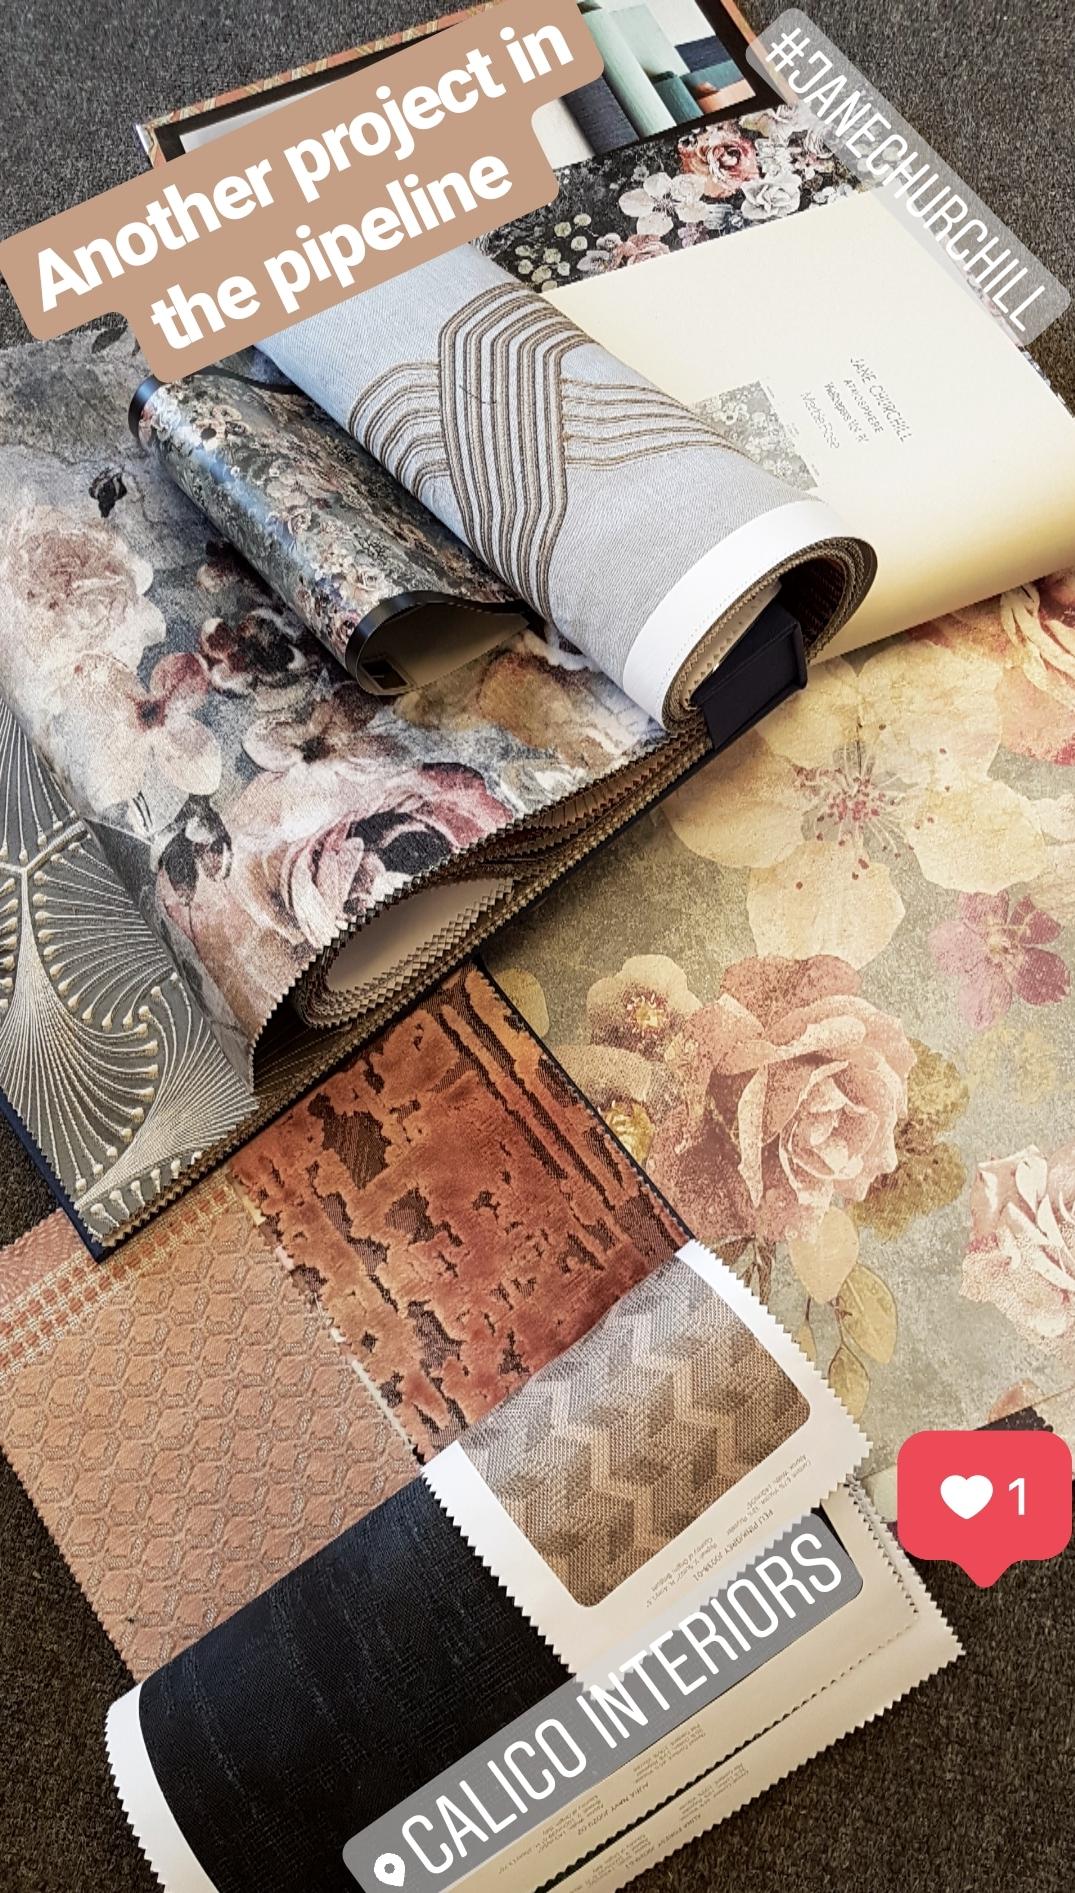 Image by Calico Interiors via  Instagram